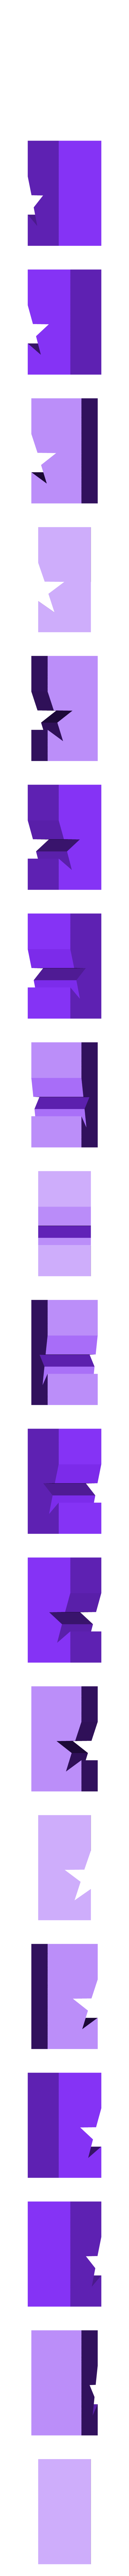 Part1estrella.STL Download free STL file star holder • 3D printing template, allv